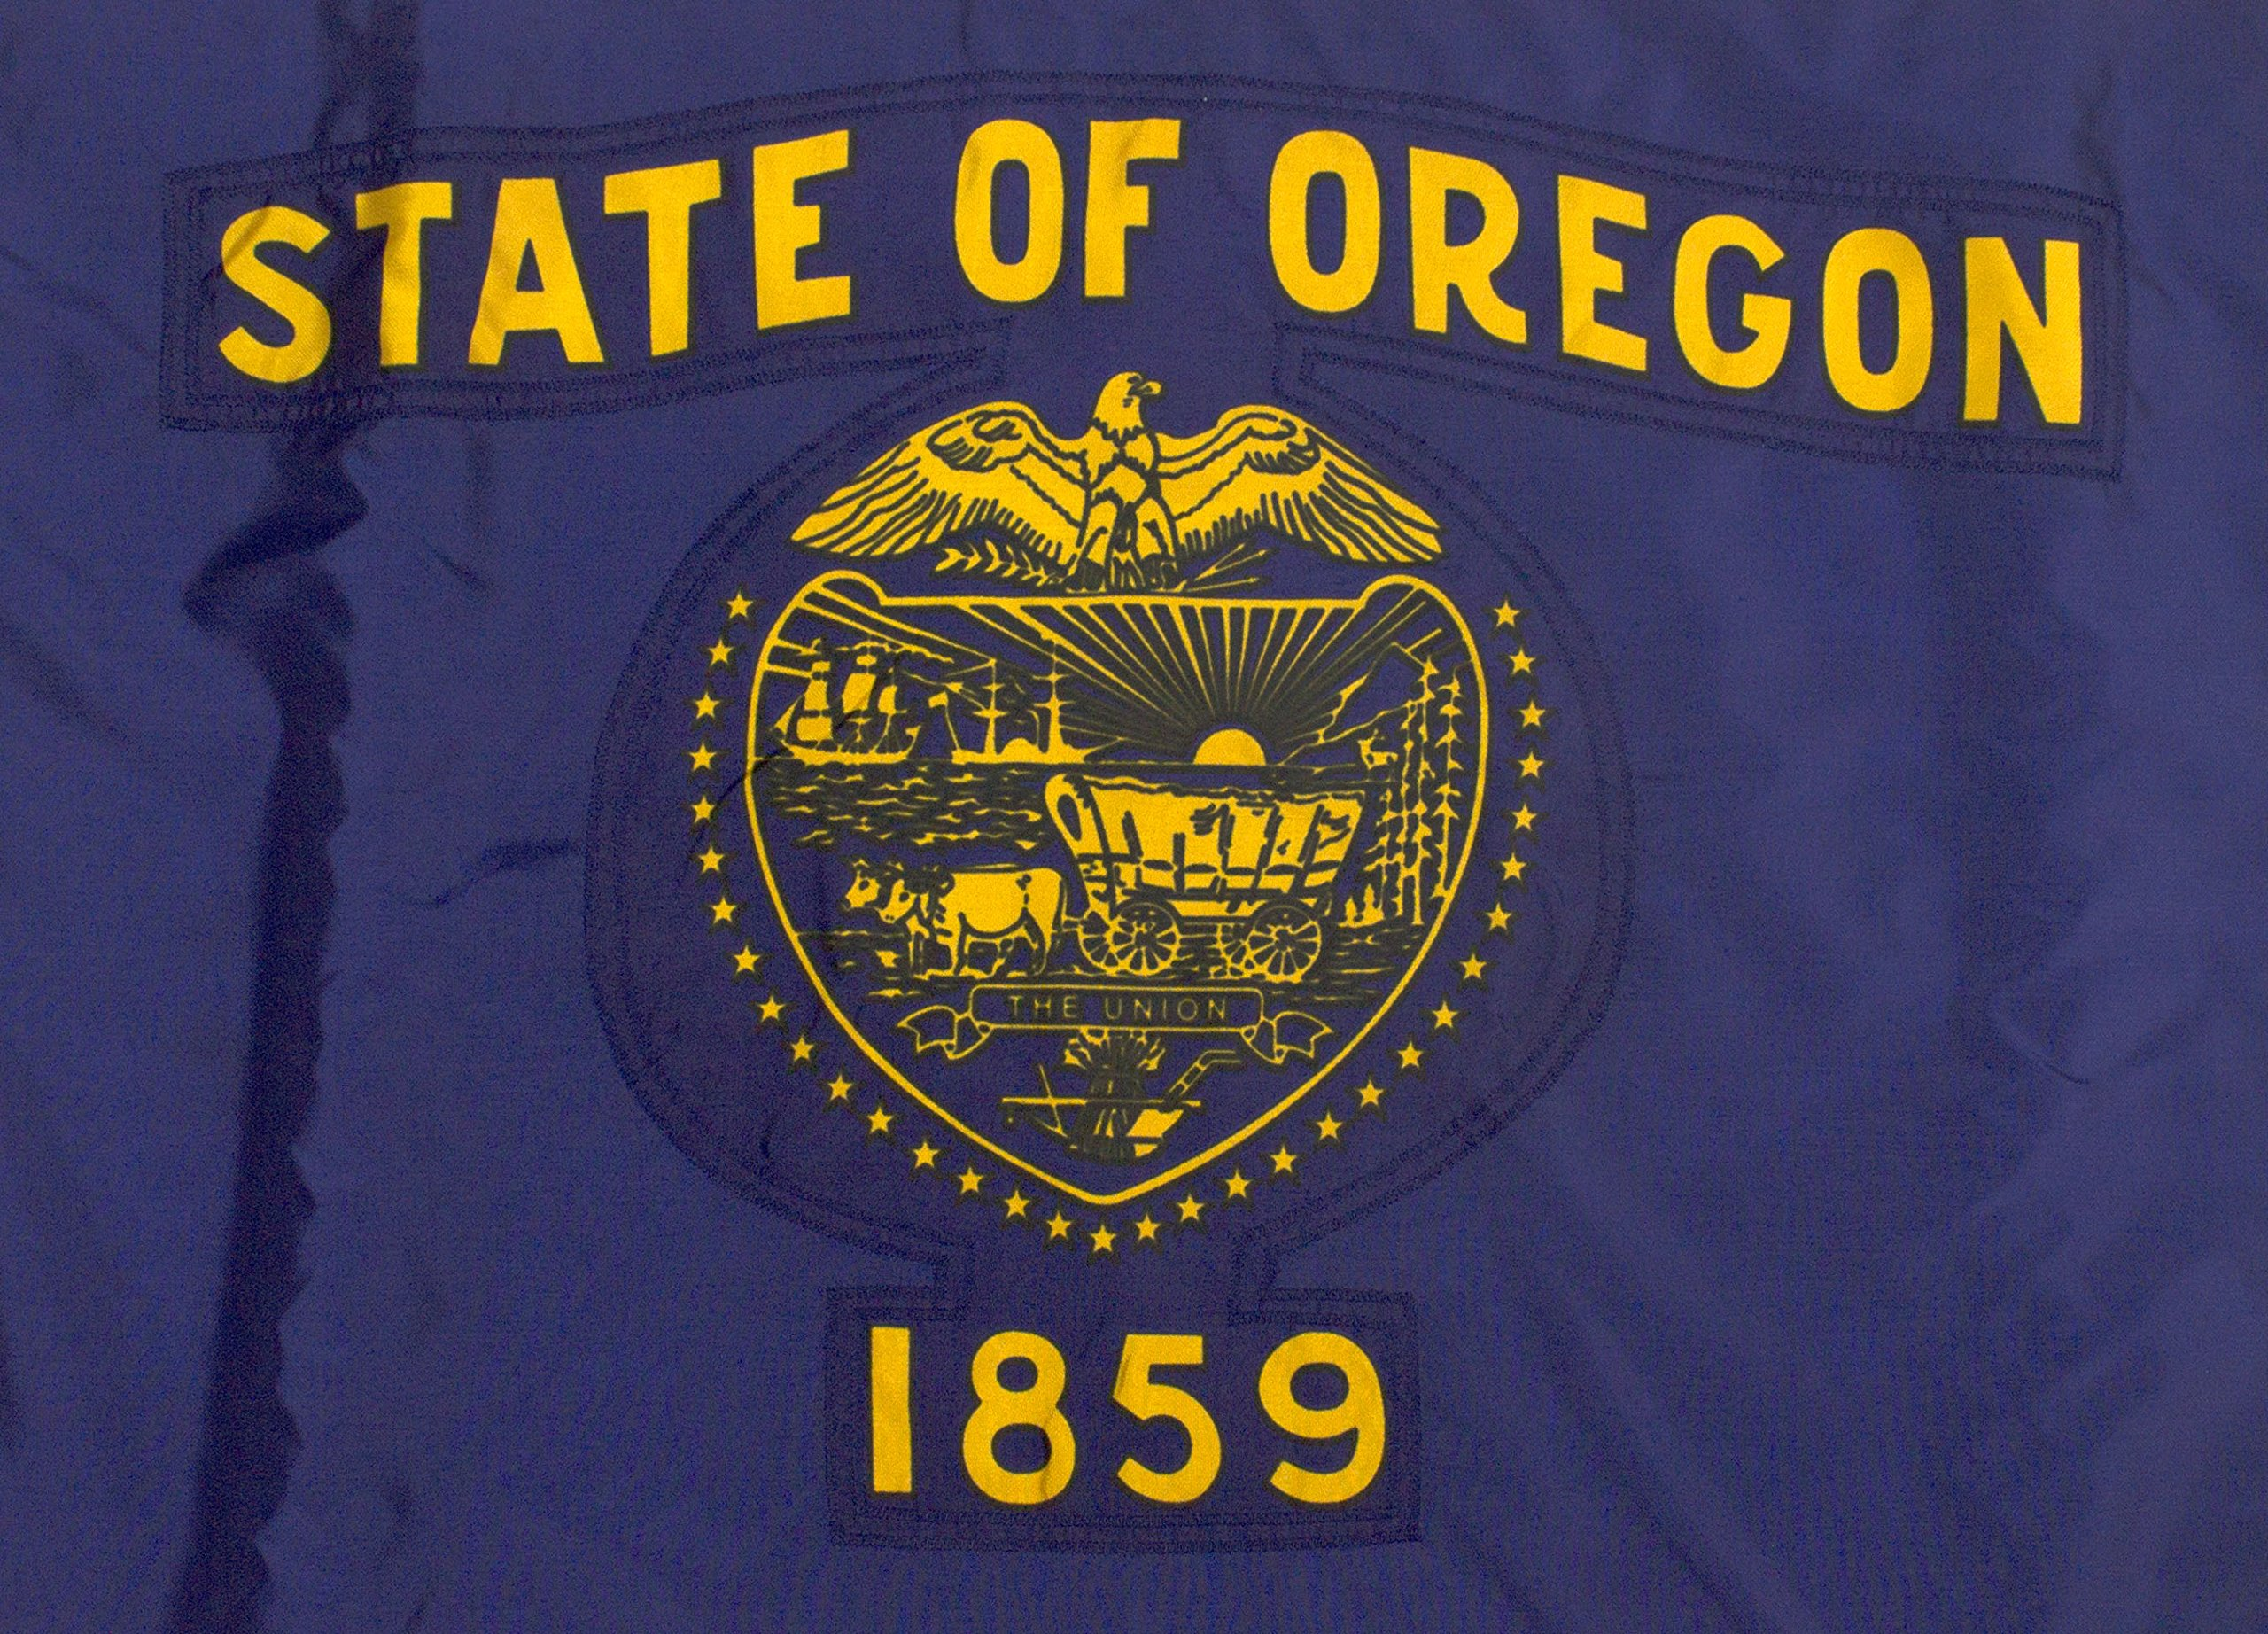 6x10ft Oregon Flag - Highest Quality Outdoor Nylon